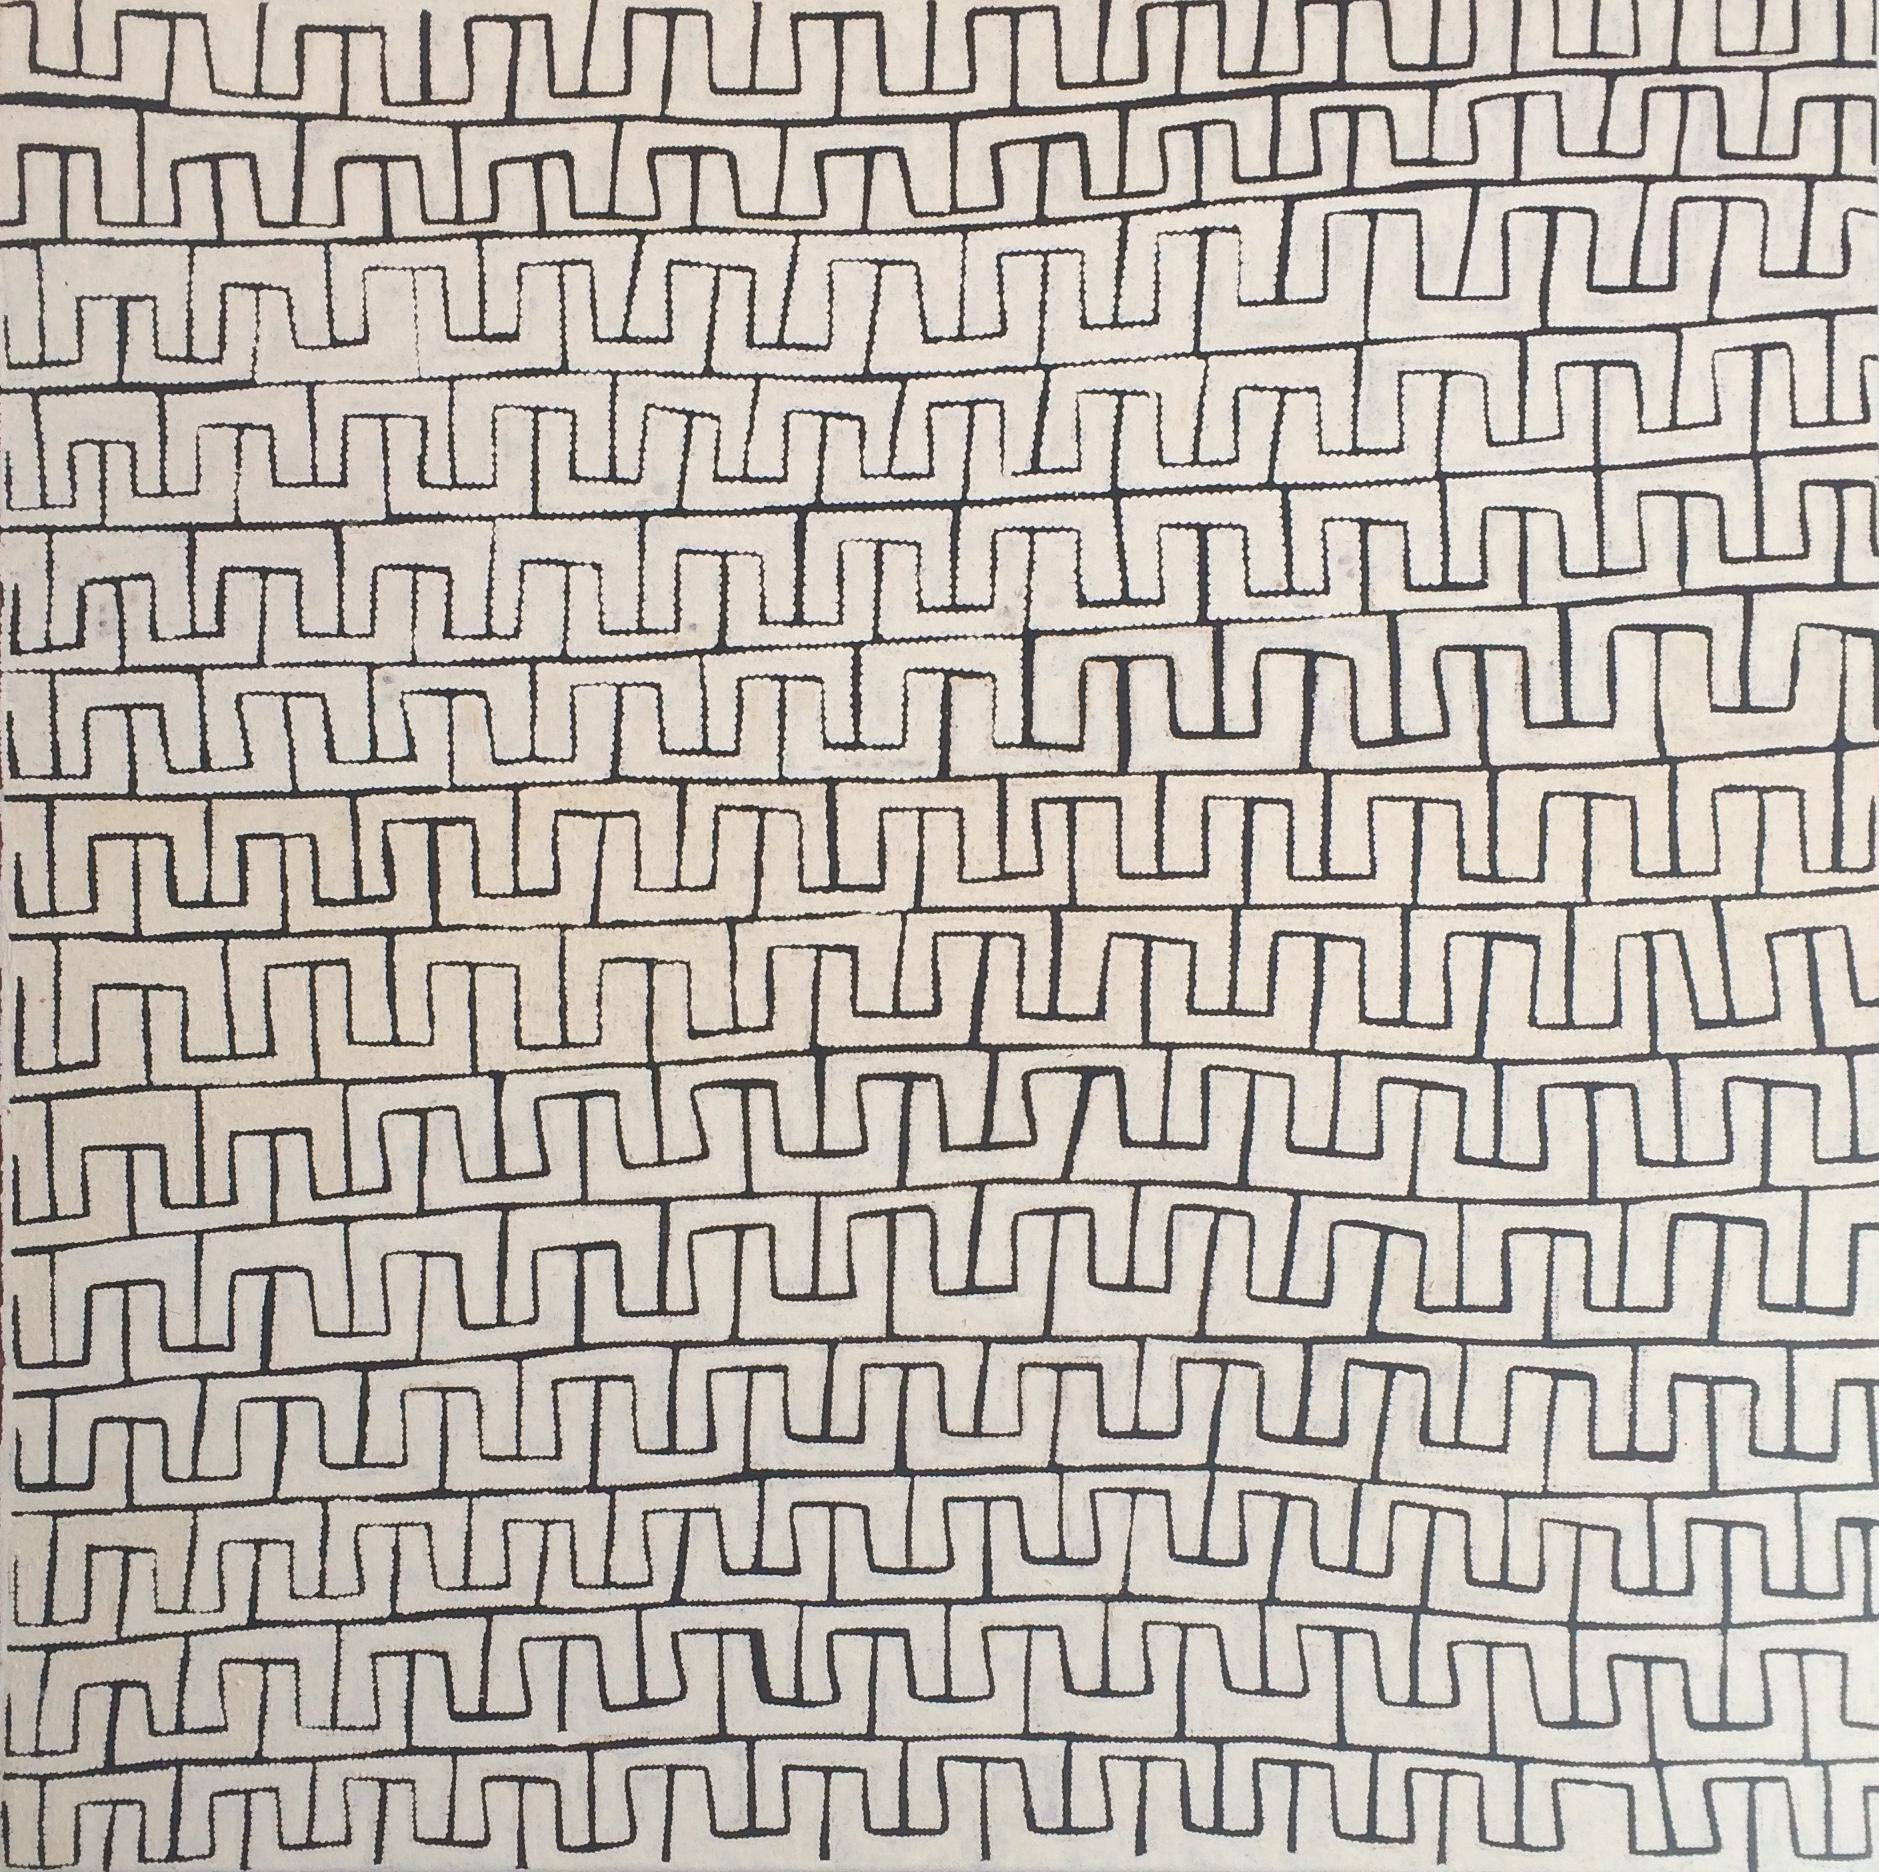 Sélection pour Knocke.  Ray James Jangala. Titre : Soakage water site of Yunala. 122 x 122 cm. Provenance : Papunya Tula Artists.